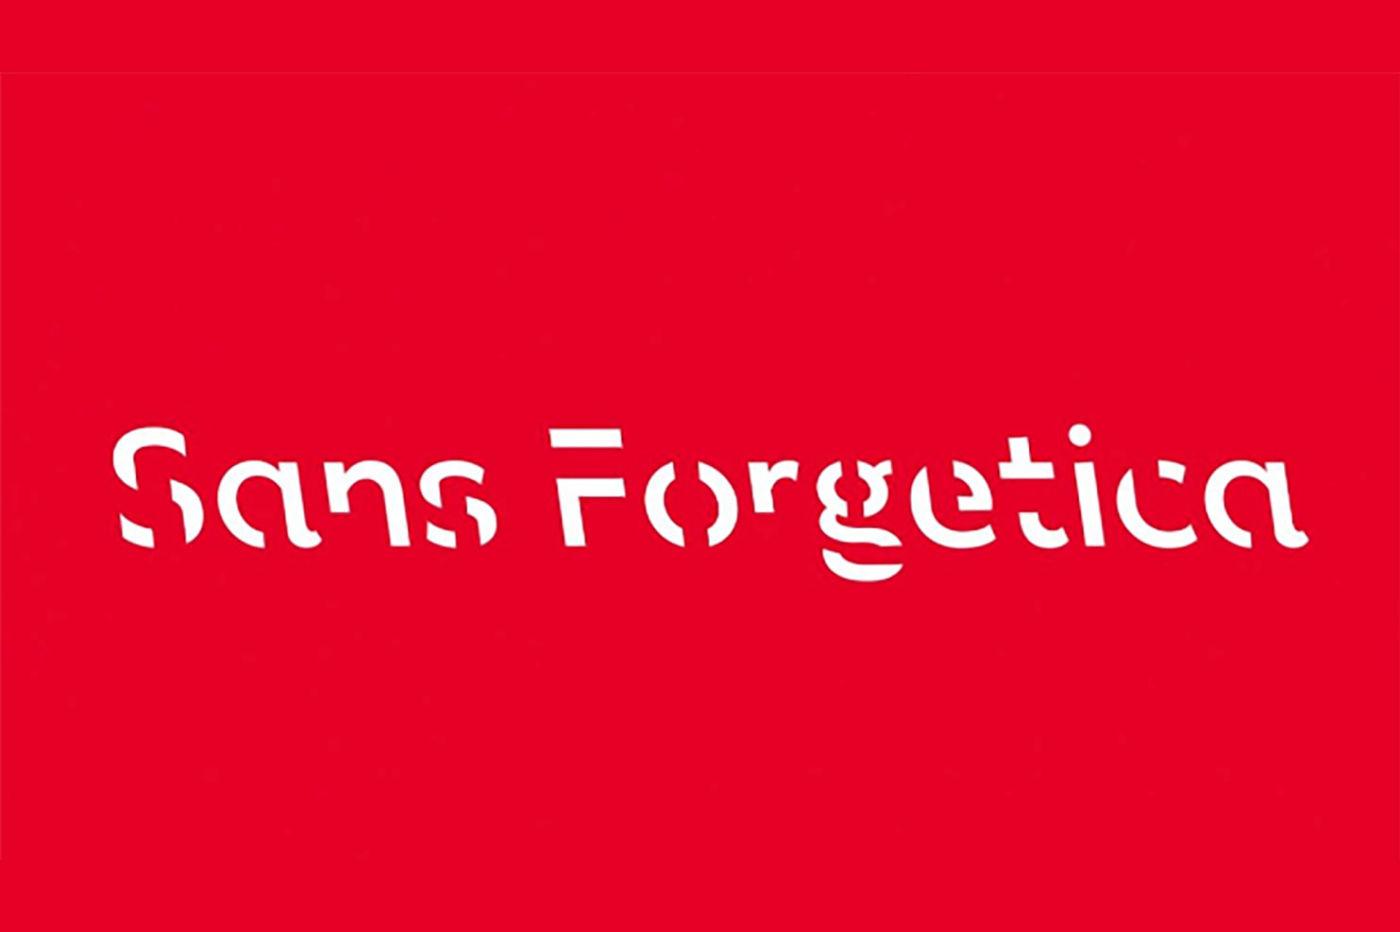 La police Sans Forgetica